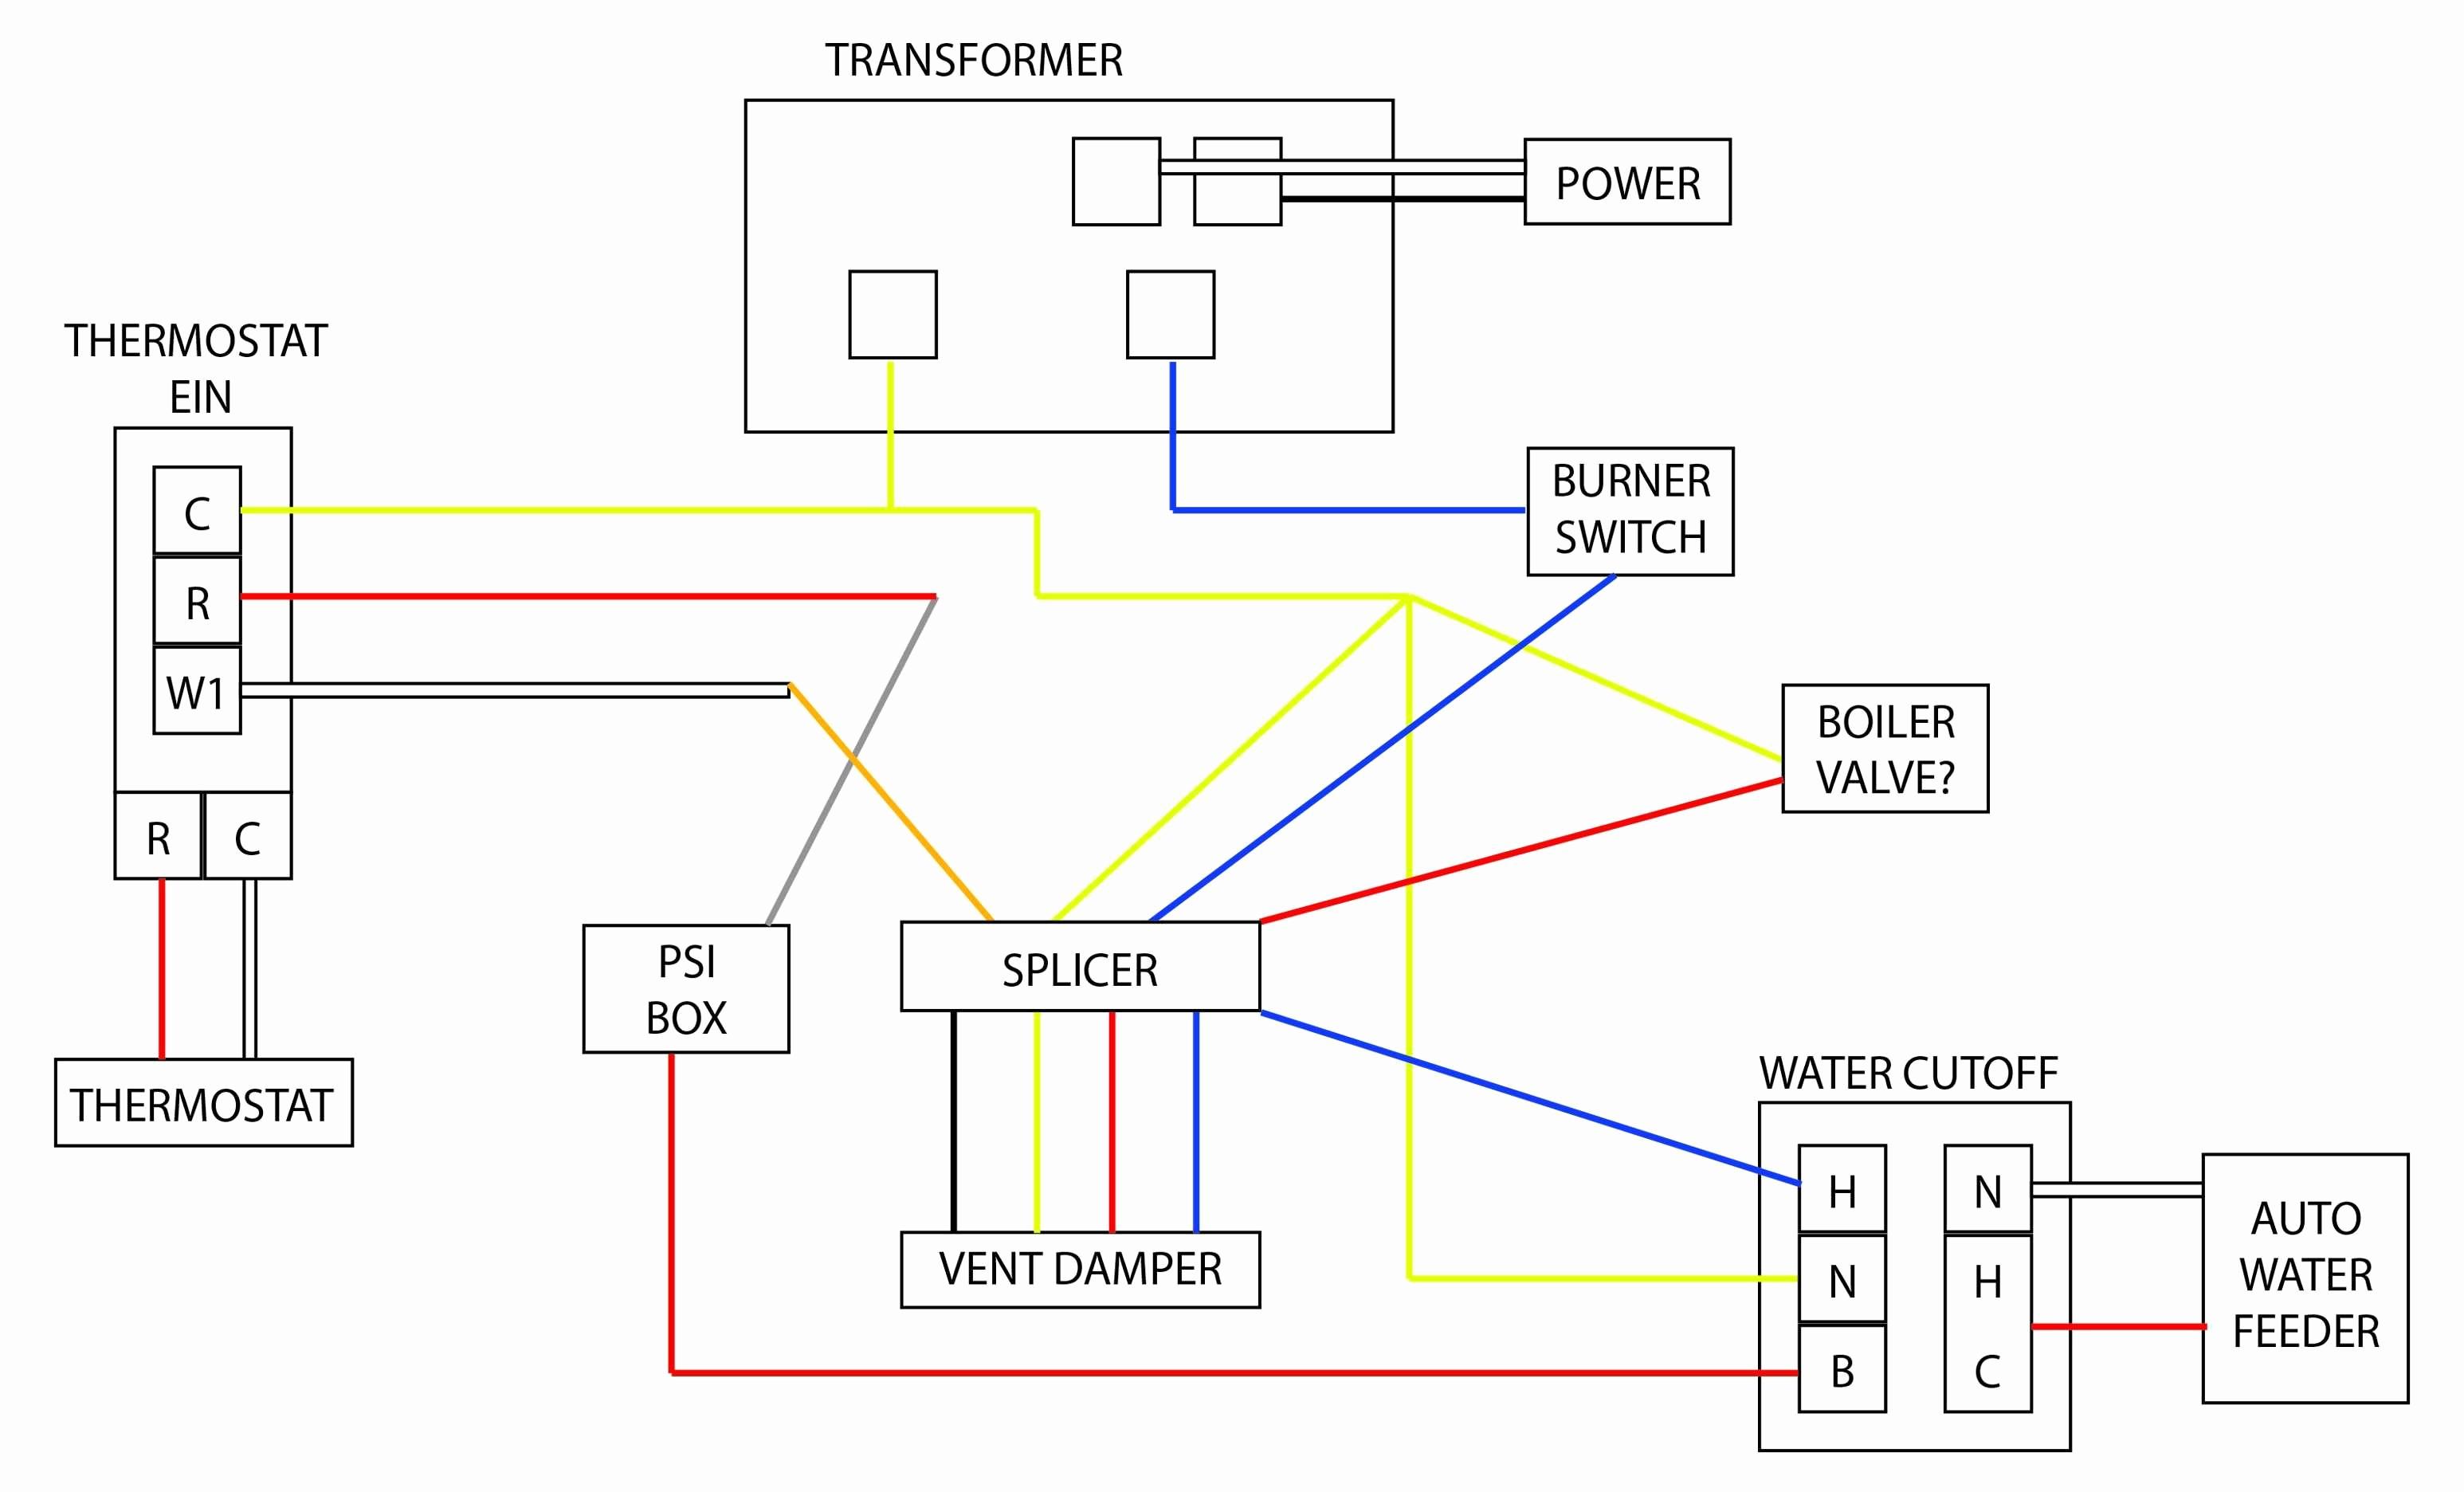 Honeywell Actuator Wiring Diagram | Schematic Diagram - Honeywell Lyric T5 Wiring Diagram